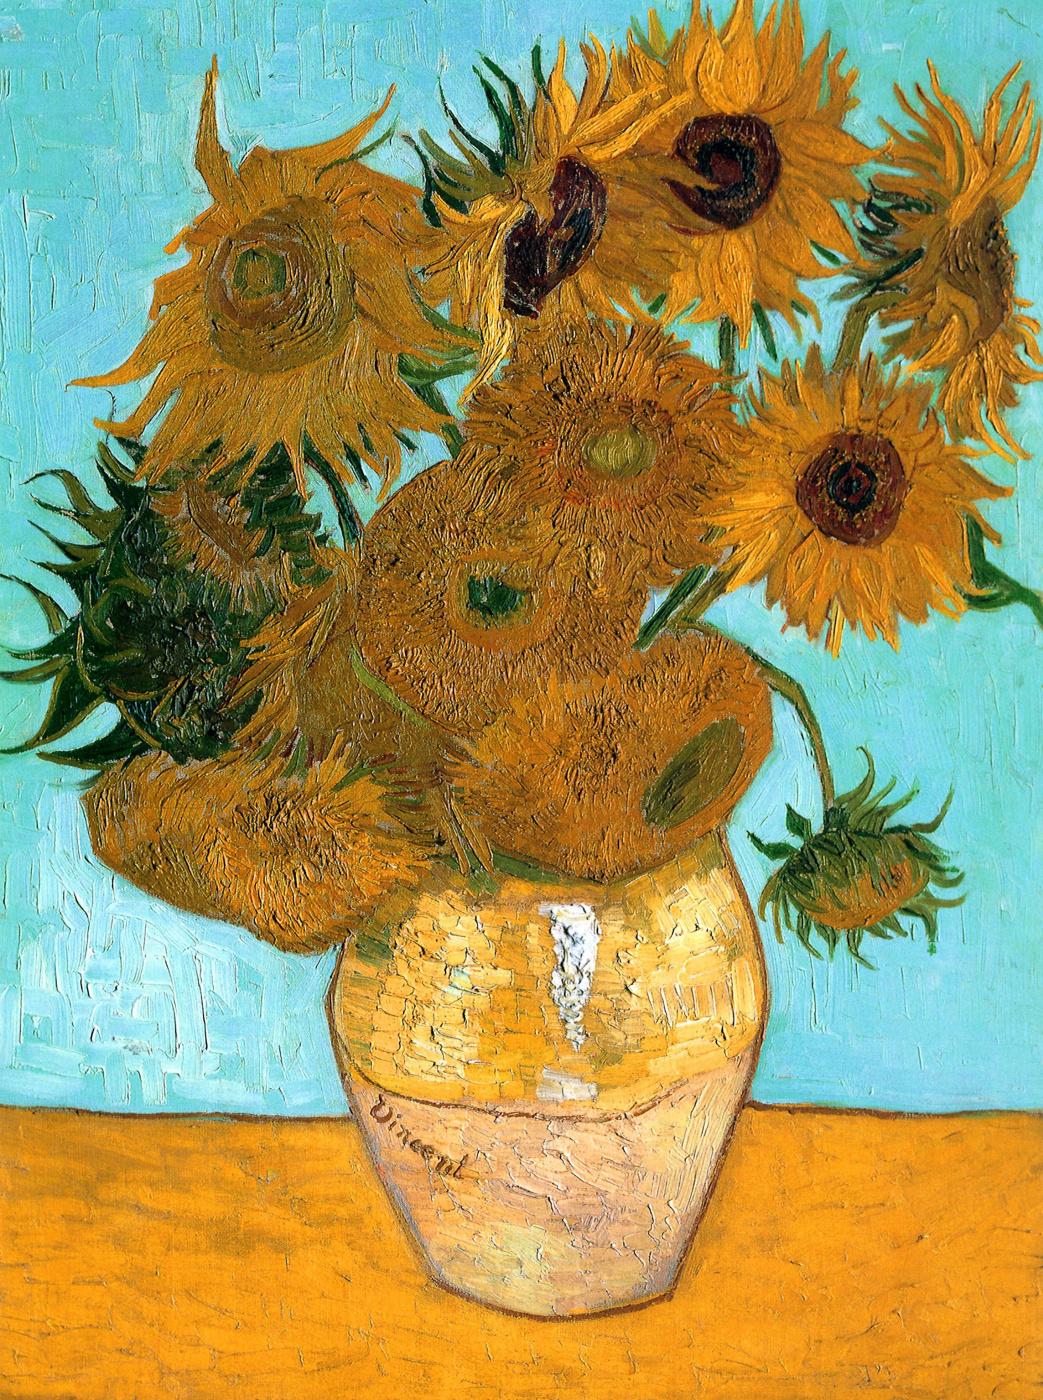 Vincent van Gogh. Twelve sunflowers in a vase & Twelve sunflowers in a vase by Vincent van Gogh: History Analysis ...